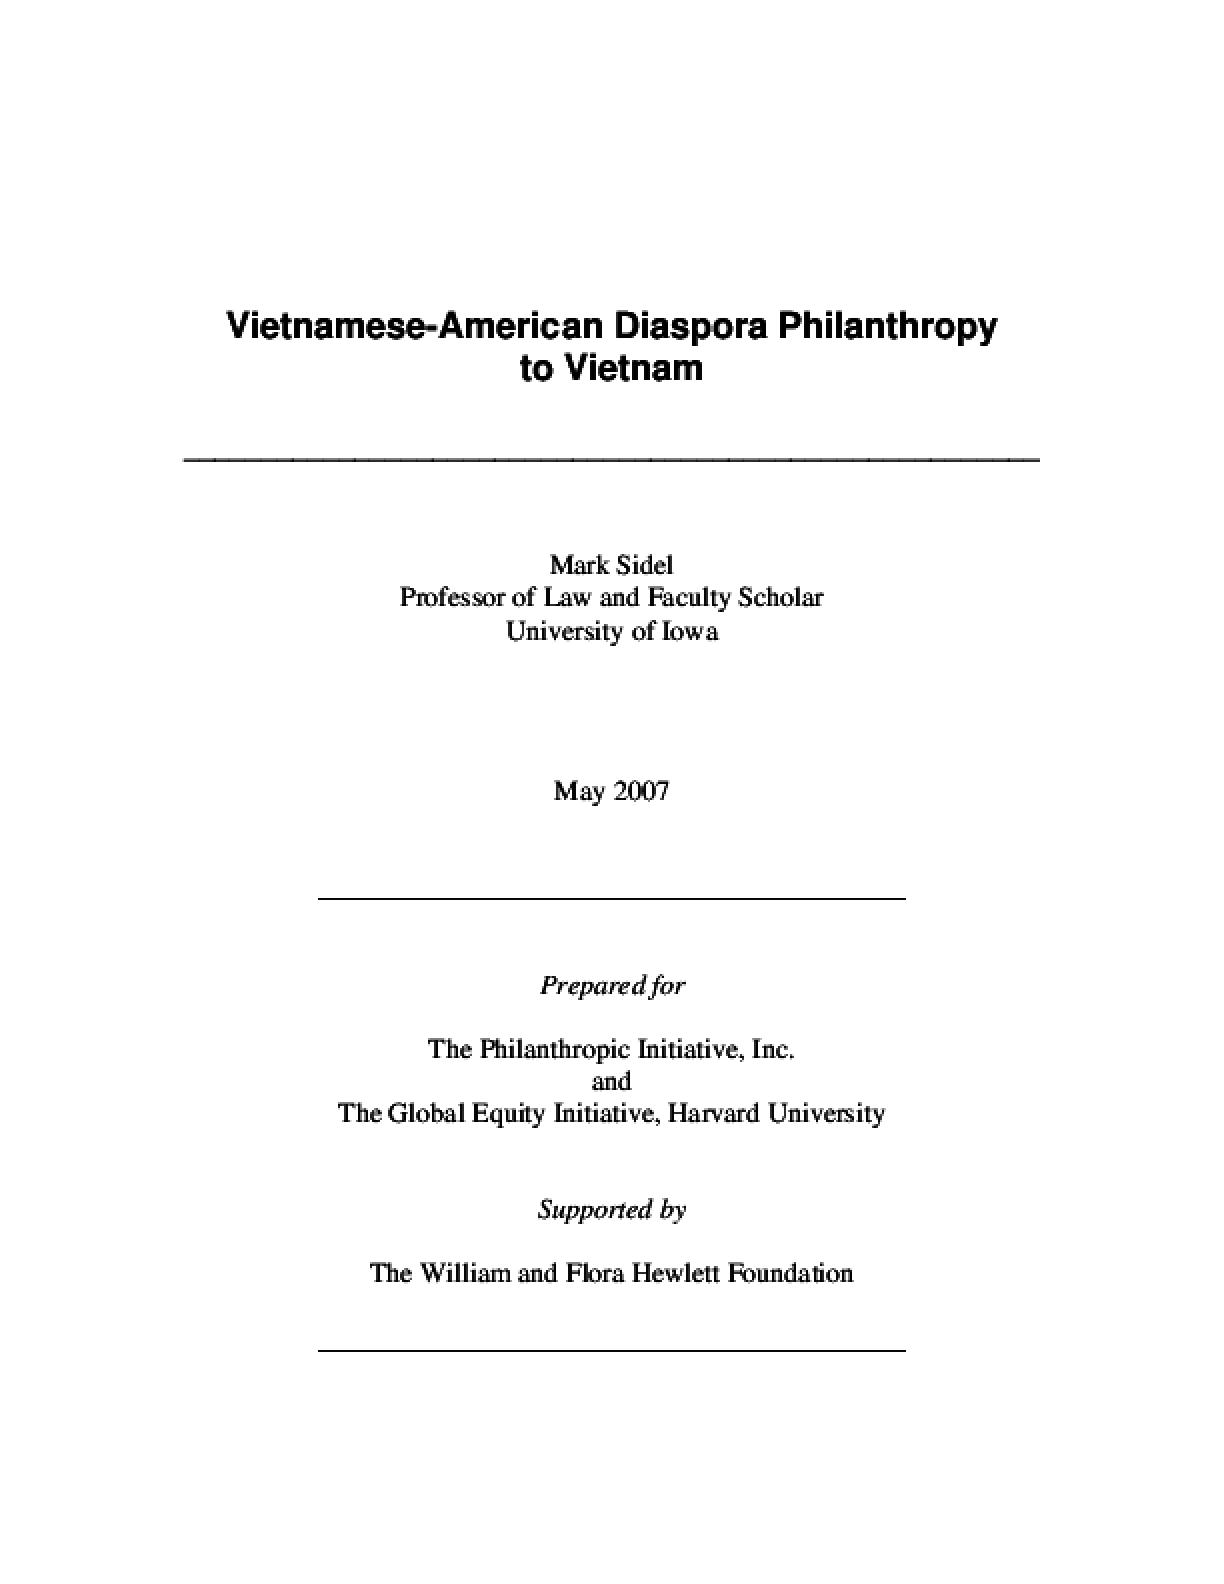 Vietnamese-American Diaspora Philanthropy to Vietnam